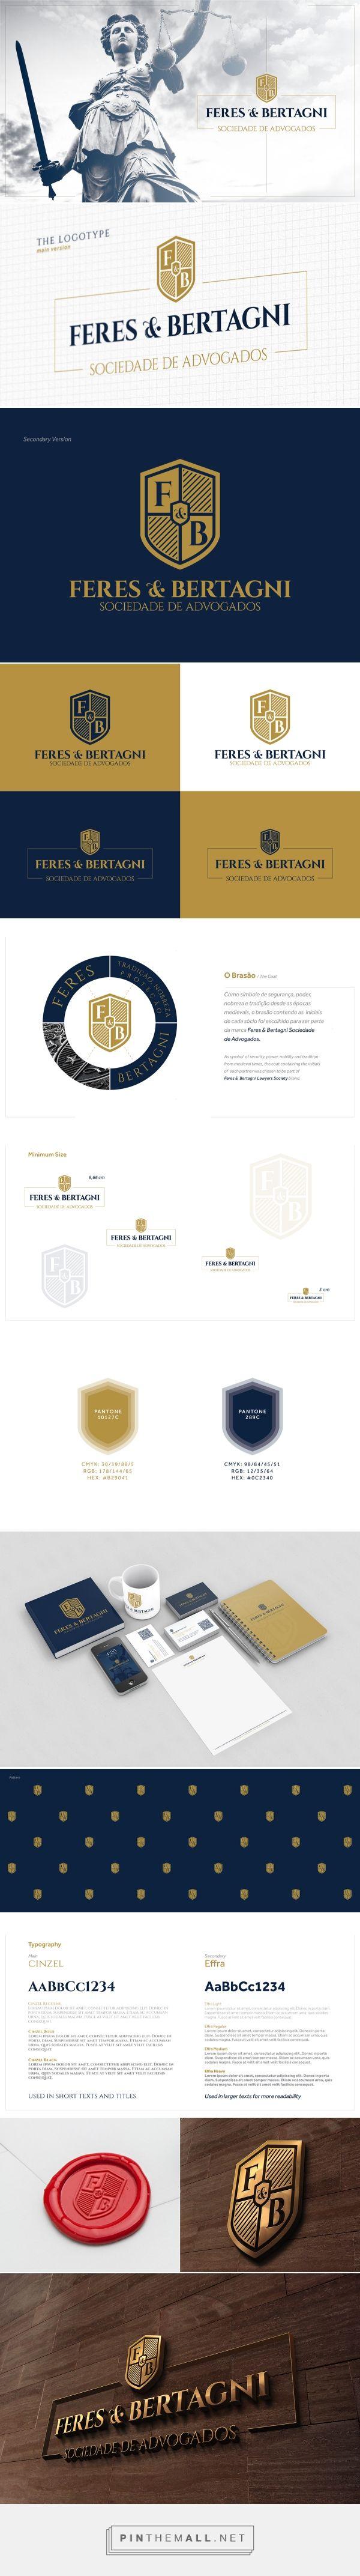 Designed by Yuri Miranda | Projeto de Identidade Visual para Feres & Bertagni Sociedade de Advogados. Baseado na forma clássica do brasão representando nobreza, segurança, solidez.